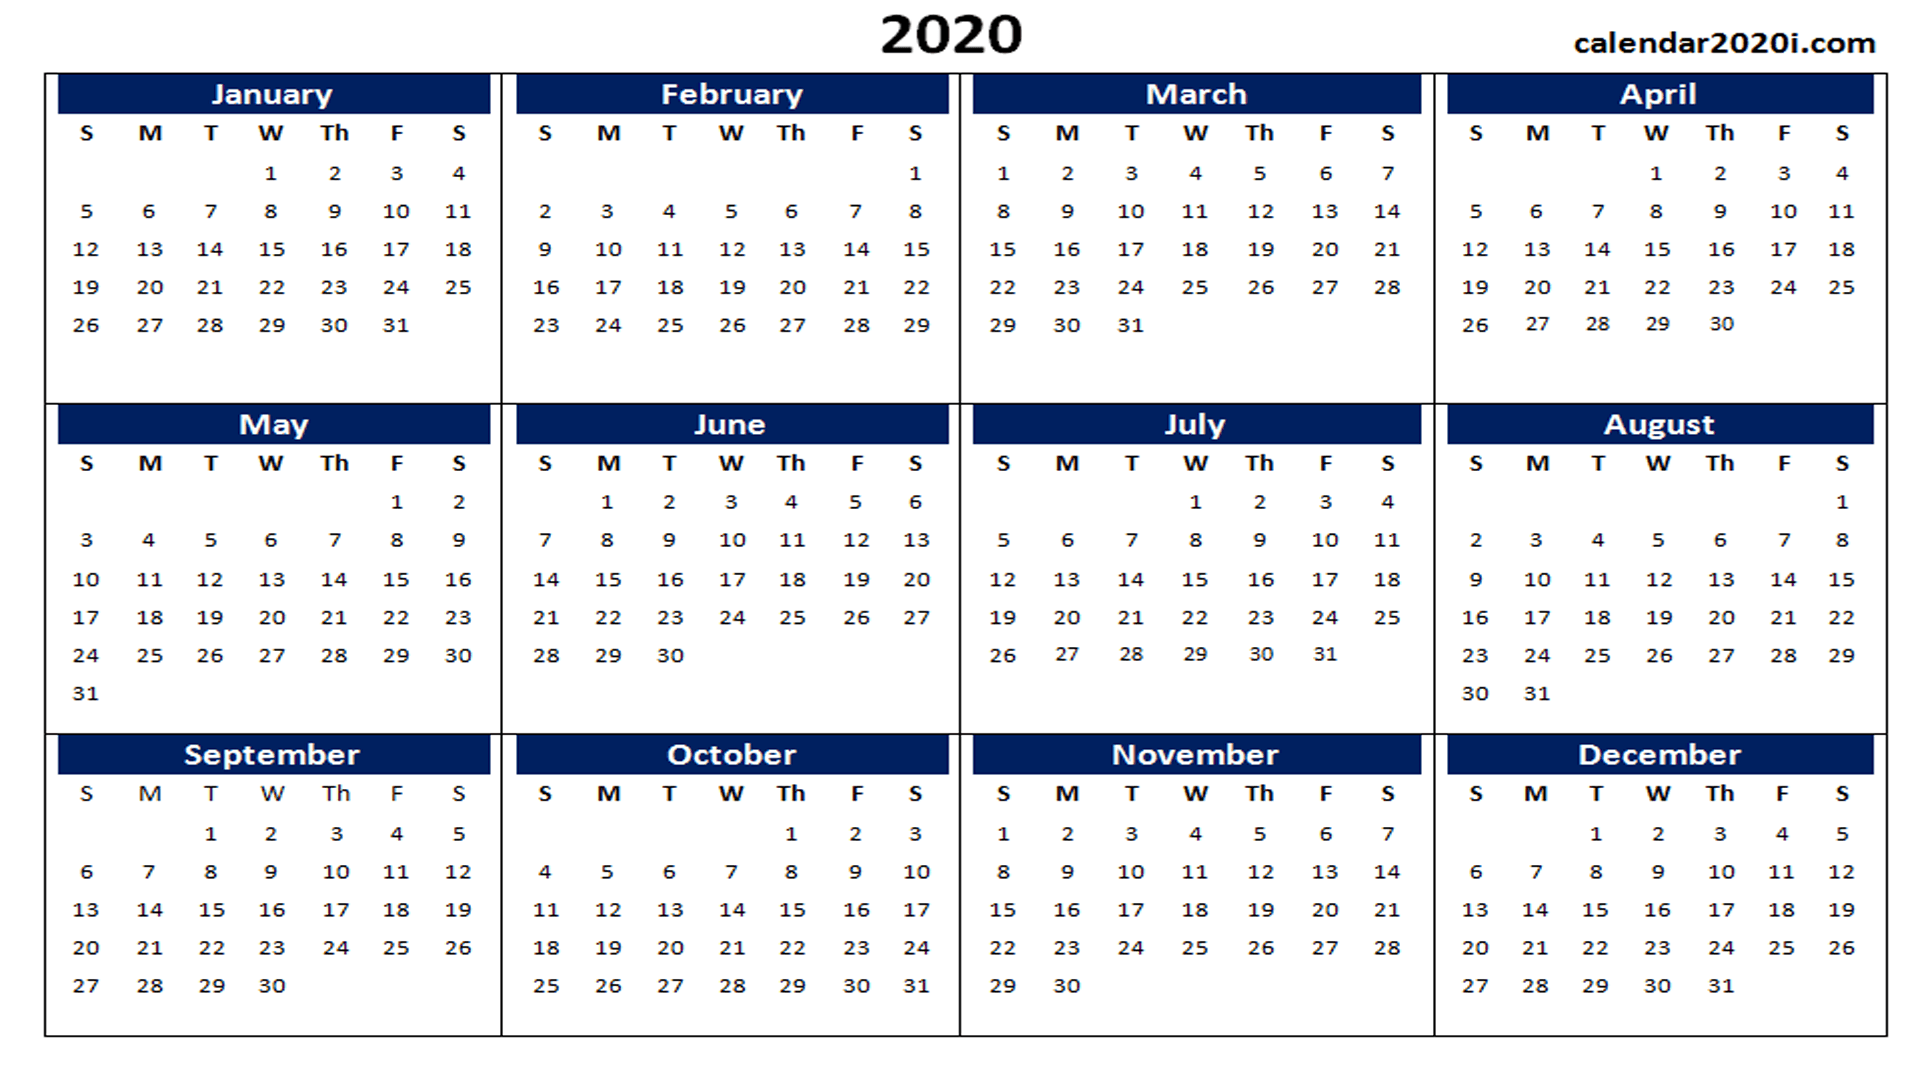 Calendar Wallpaper 2020 2020 Calendar Wallpapers   Wallpaper Cave